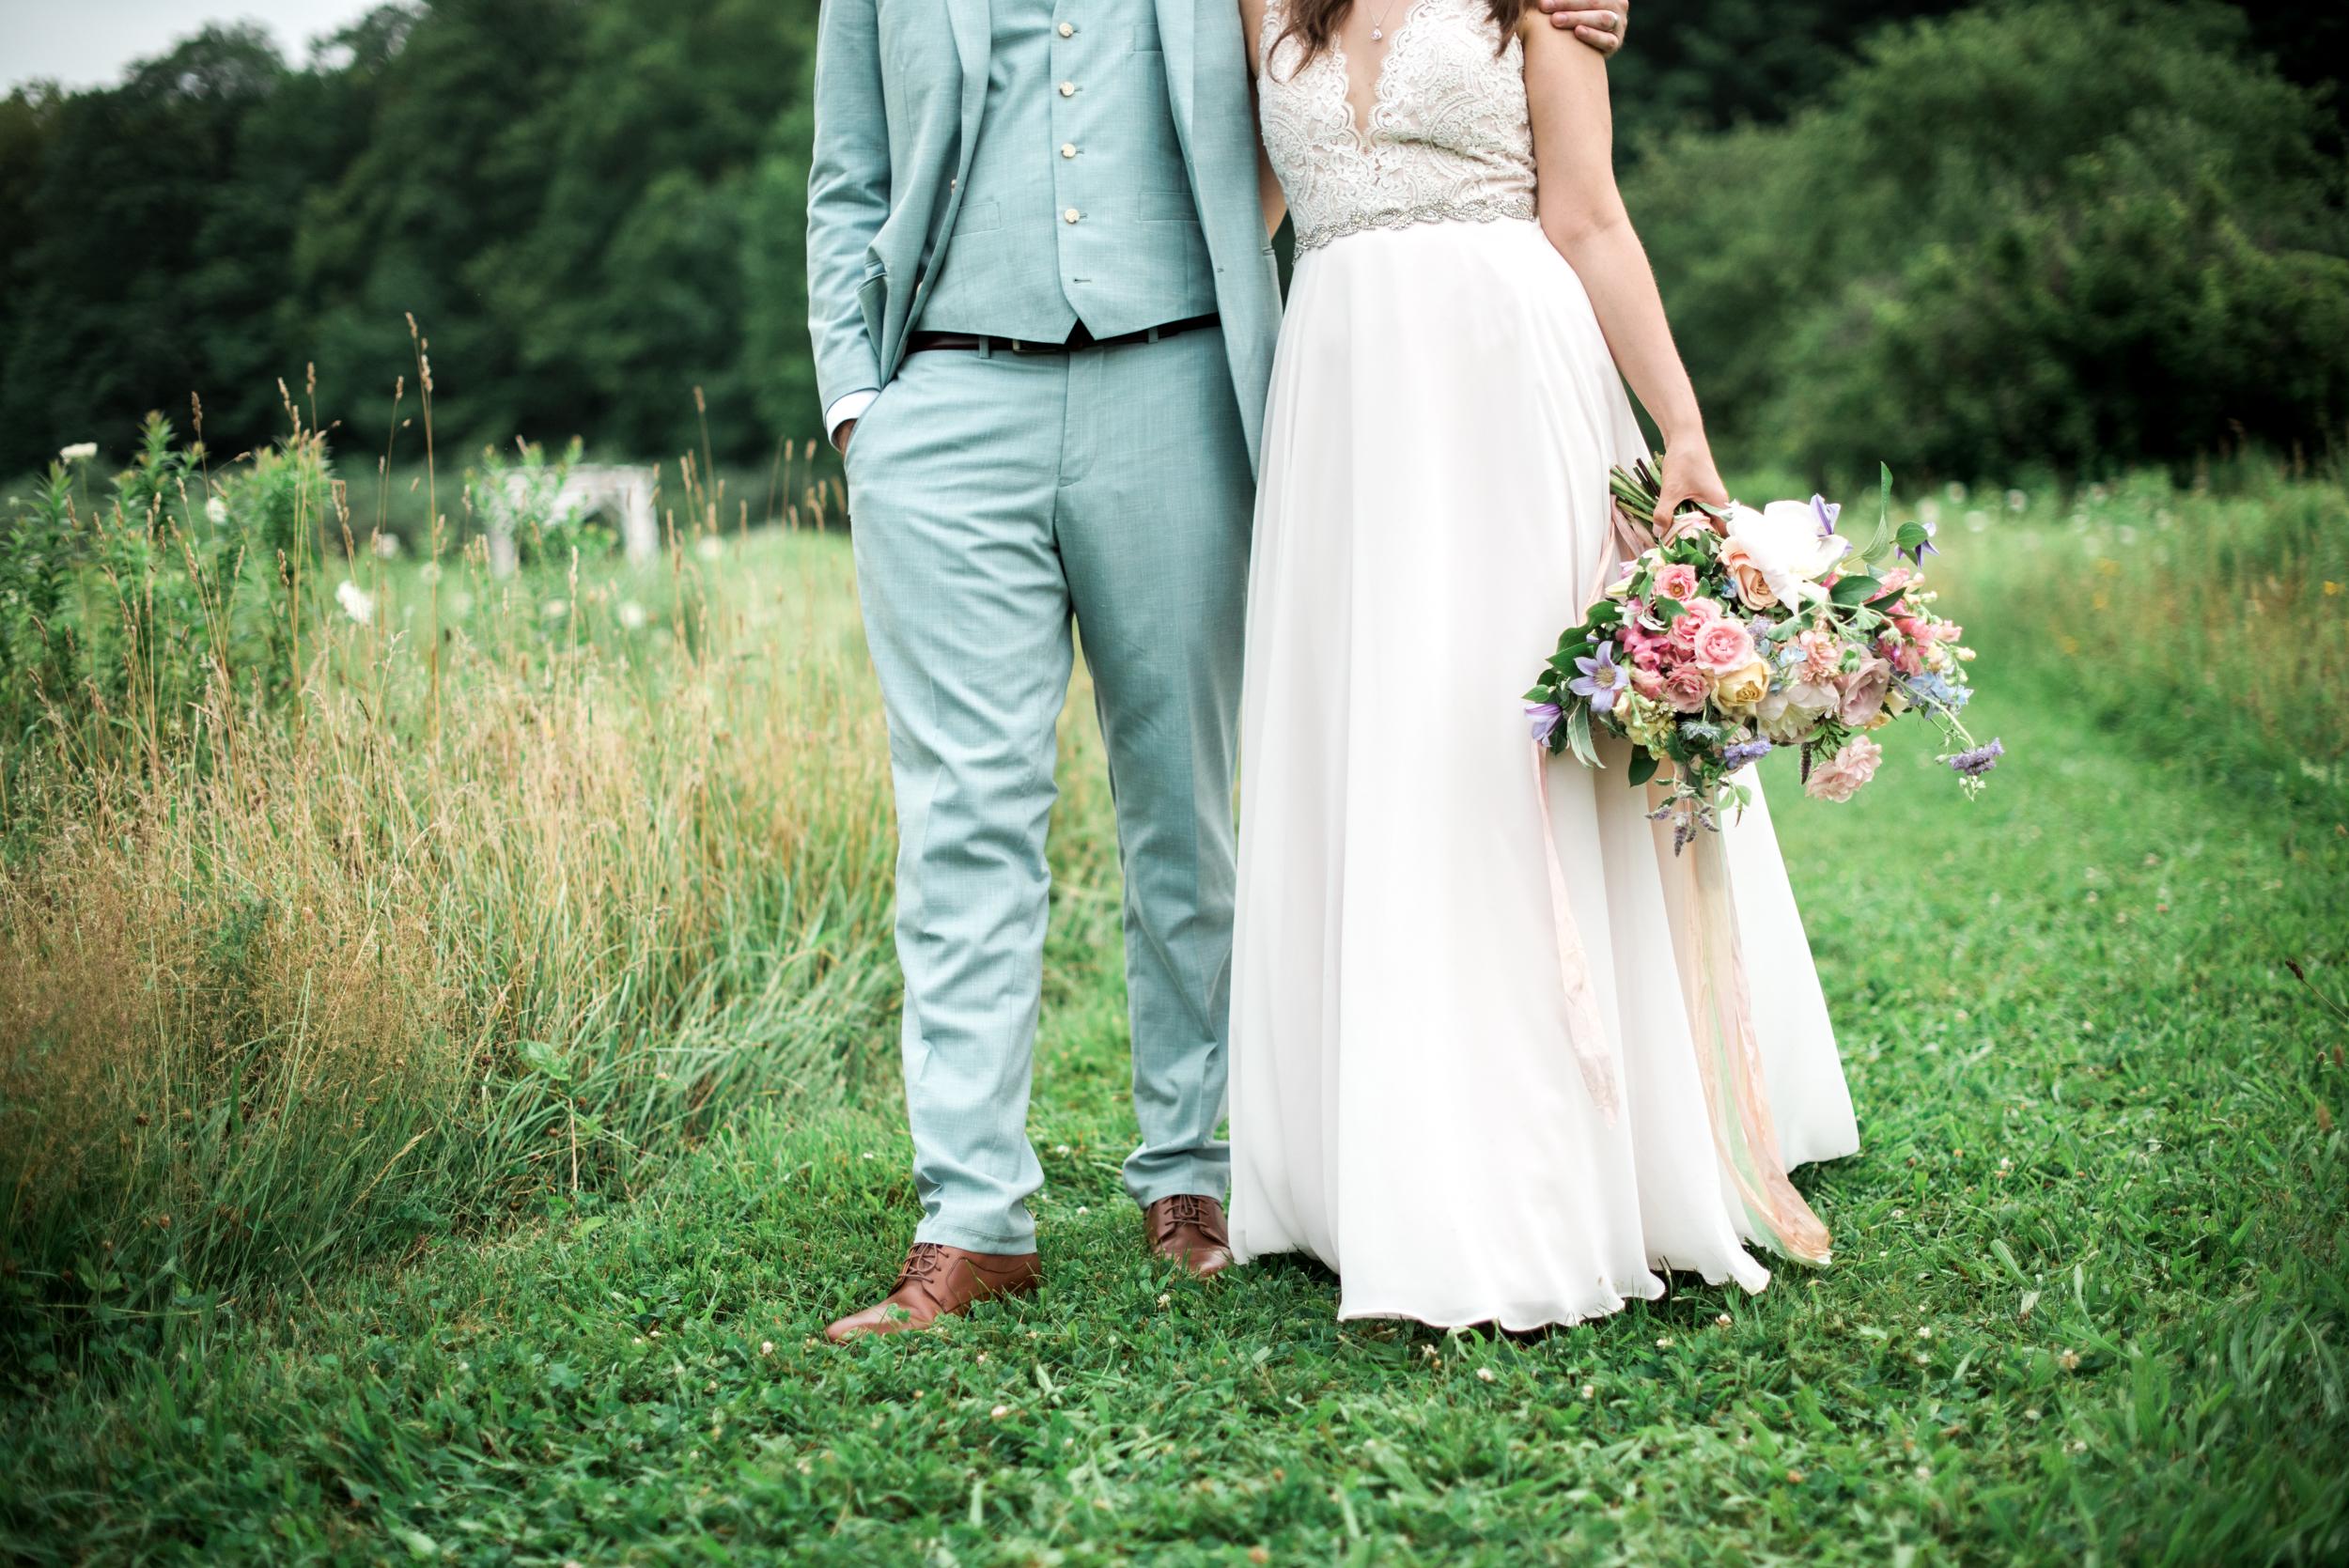 Fine art wedding photographers in Boston